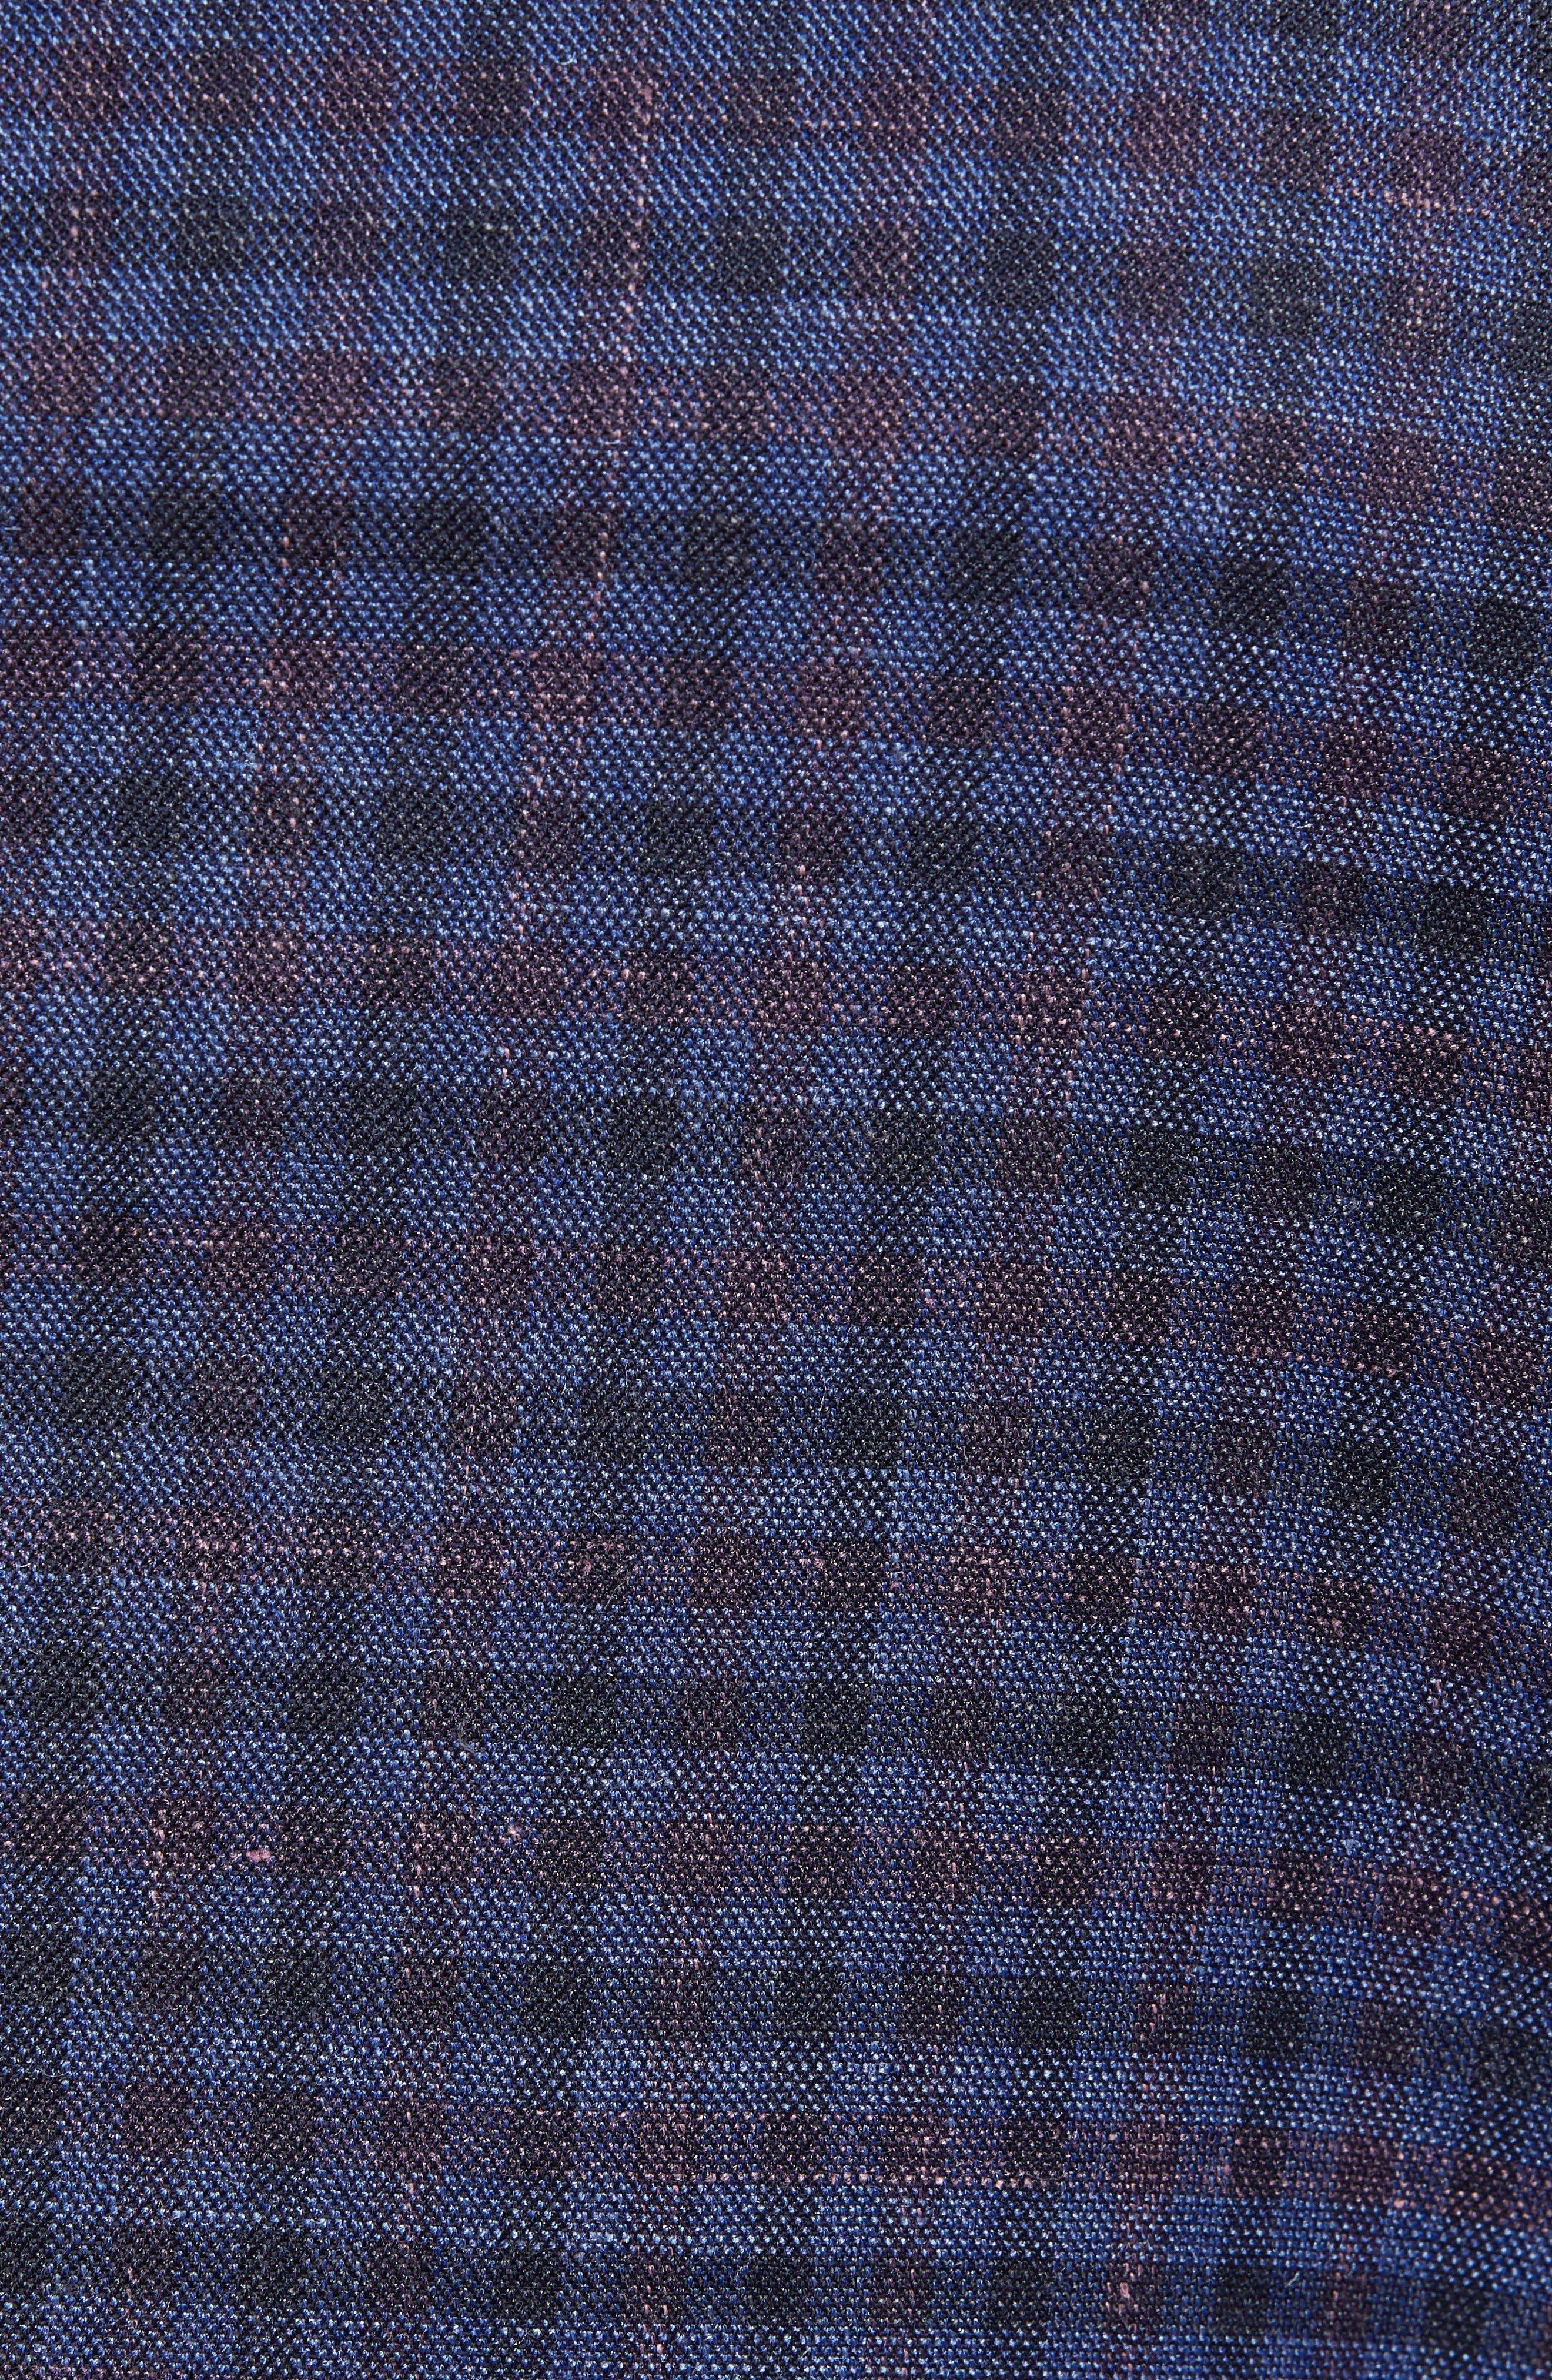 Hyperlight Classic Fit Check Wool Blend Sport Coat,                             Alternate thumbnail 6, color,                             BLUE